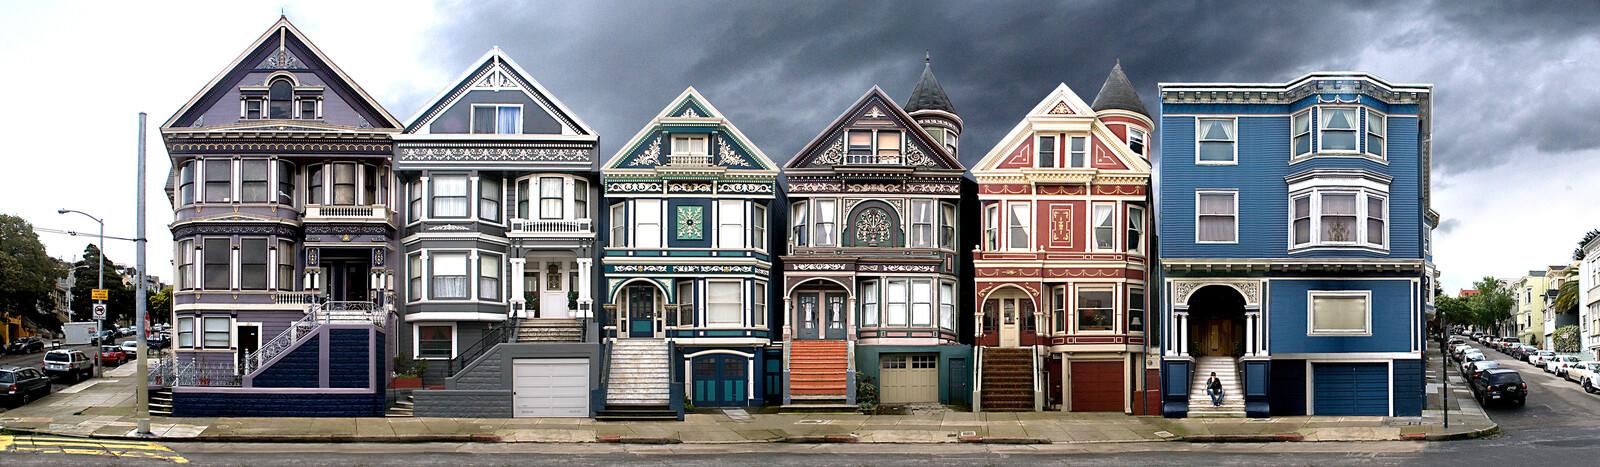 San Francisco, Waller St. - Larry Yust